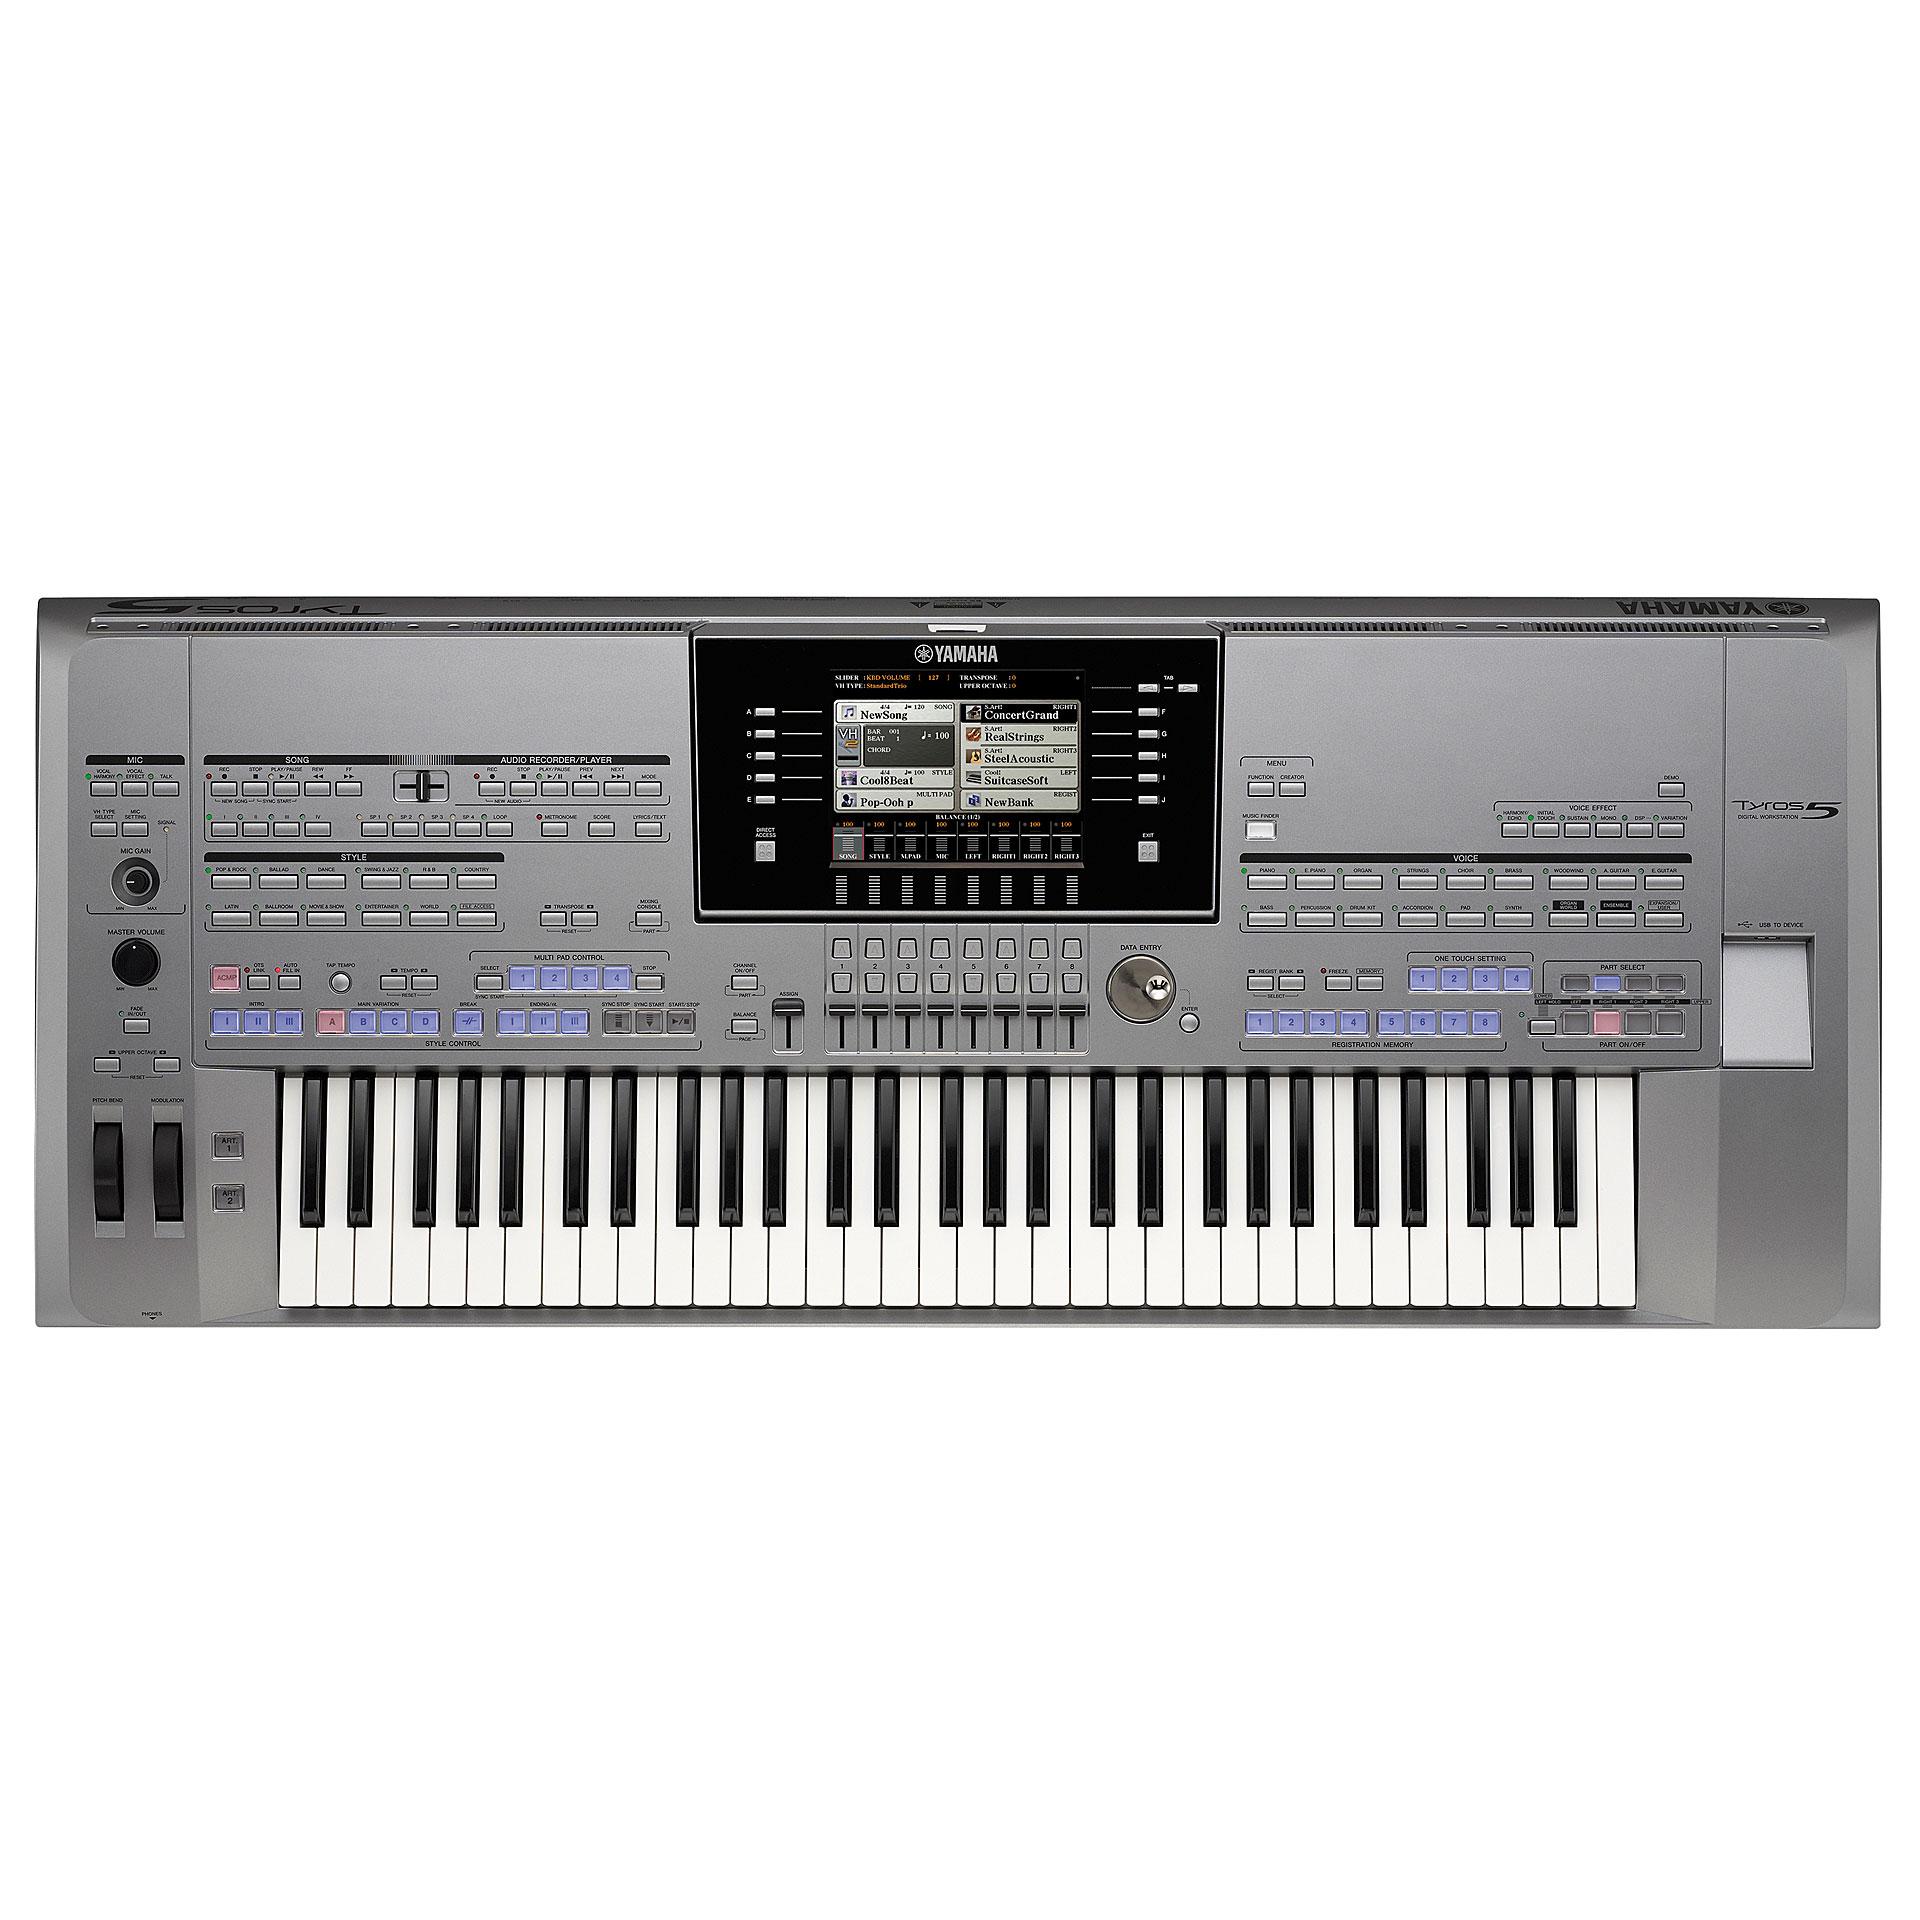 yamaha tyros 5 61 keyboard. Black Bedroom Furniture Sets. Home Design Ideas